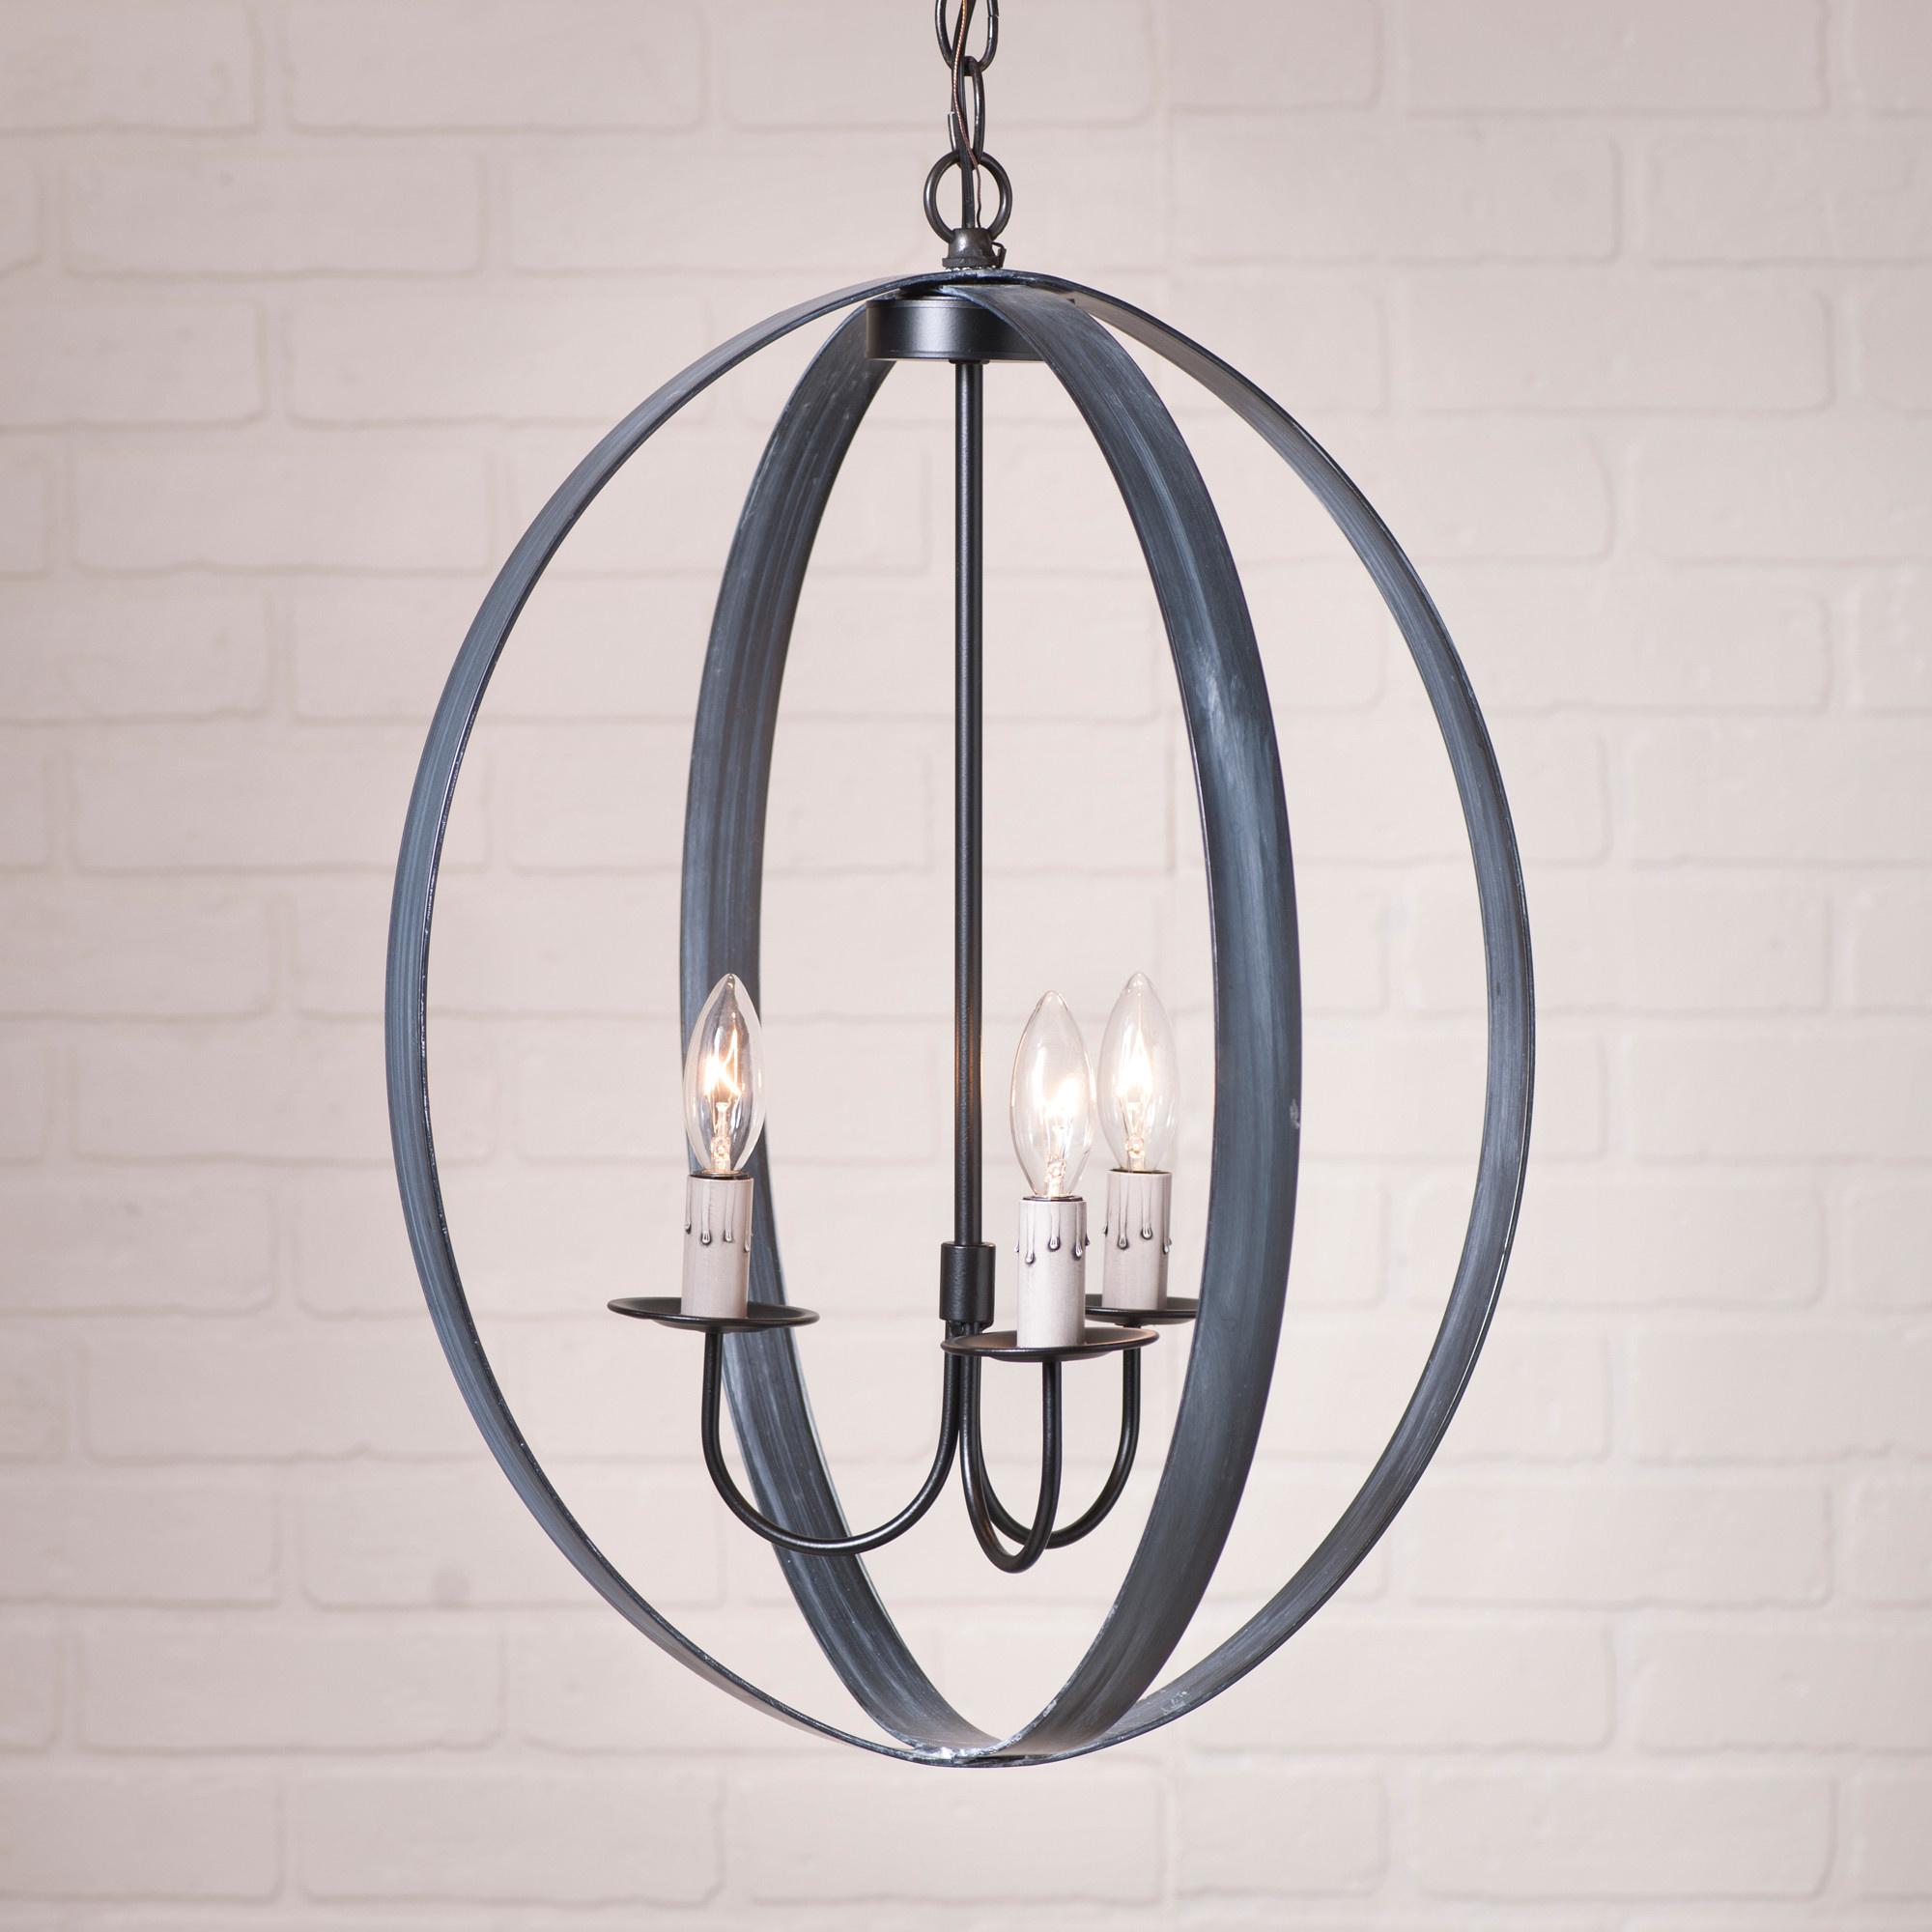 "Irvin's Tinware 20"" Oval Sphere Chandelier in Black"